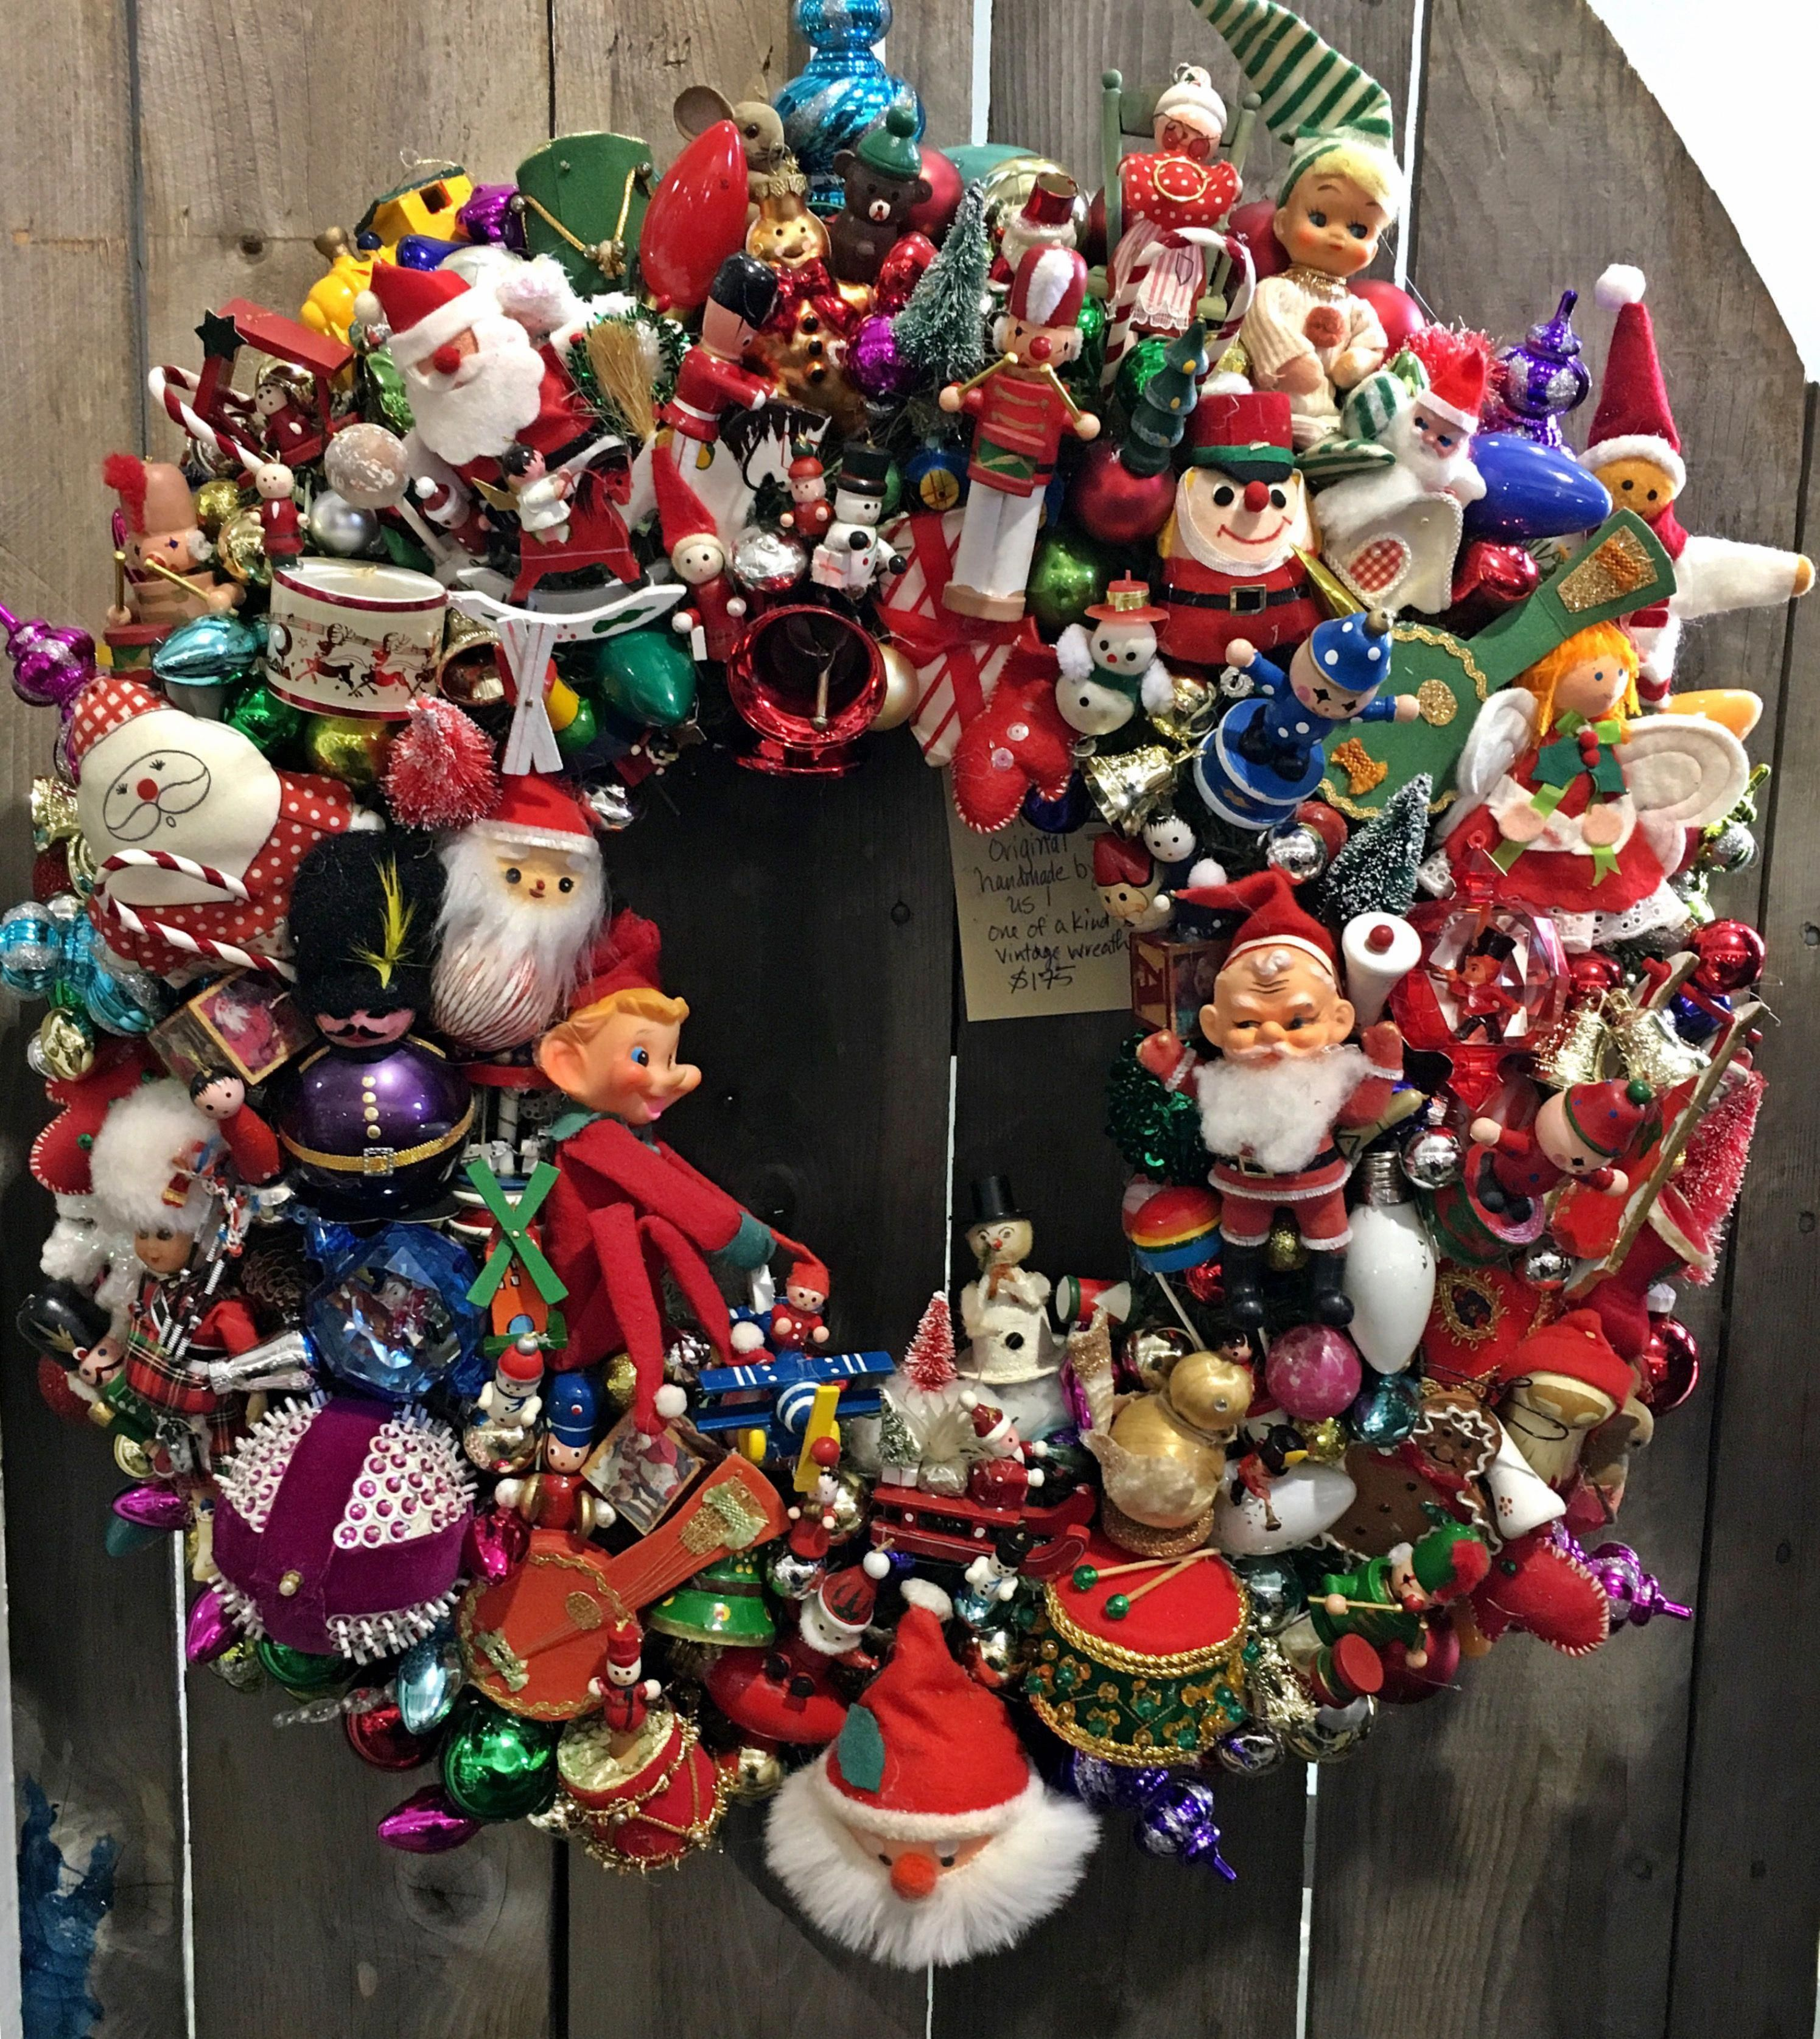 Great Vintage Ornament Wreath Vintagechristmas Christmas Ornament Wreath Christmas Wreaths Vintage Ornament Wreath